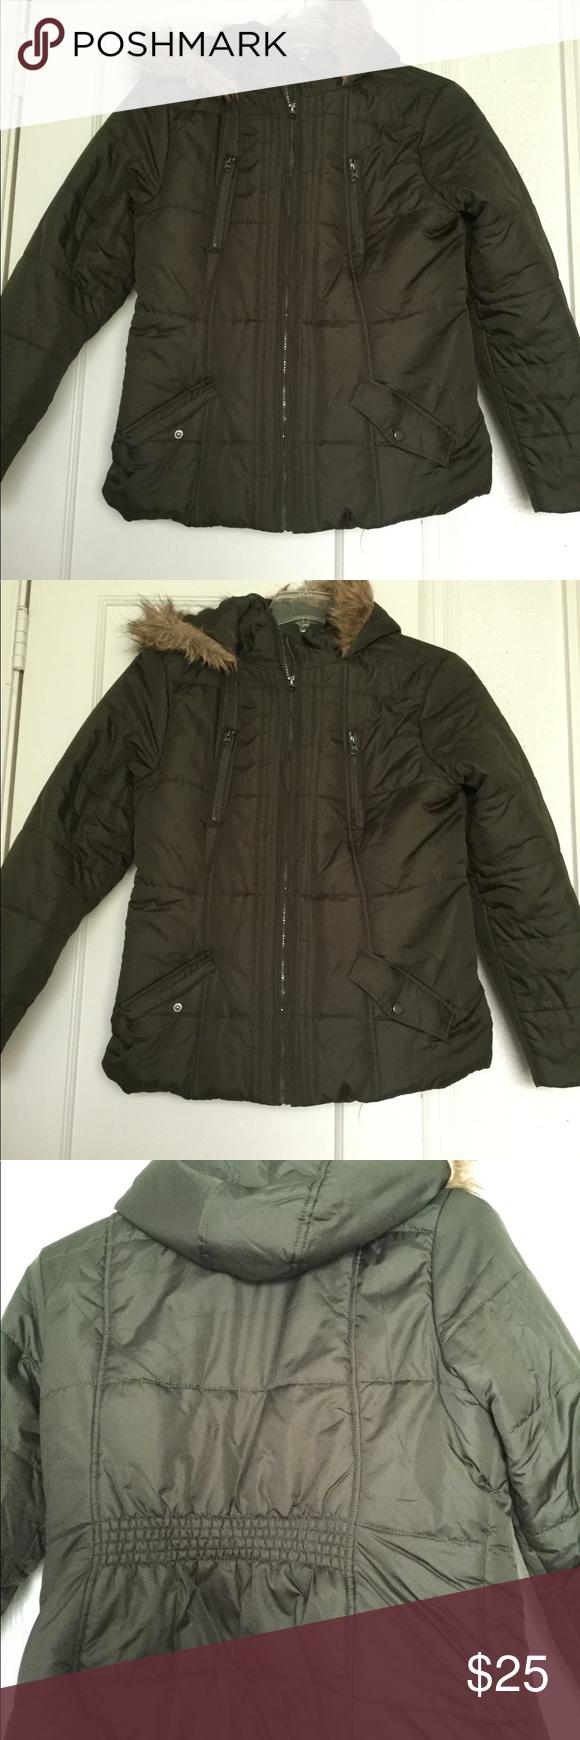 Junior Puff Coat Junior Winter Coats Girls Winter Coats Red Puffer Jacket [ 1740 x 580 Pixel ]